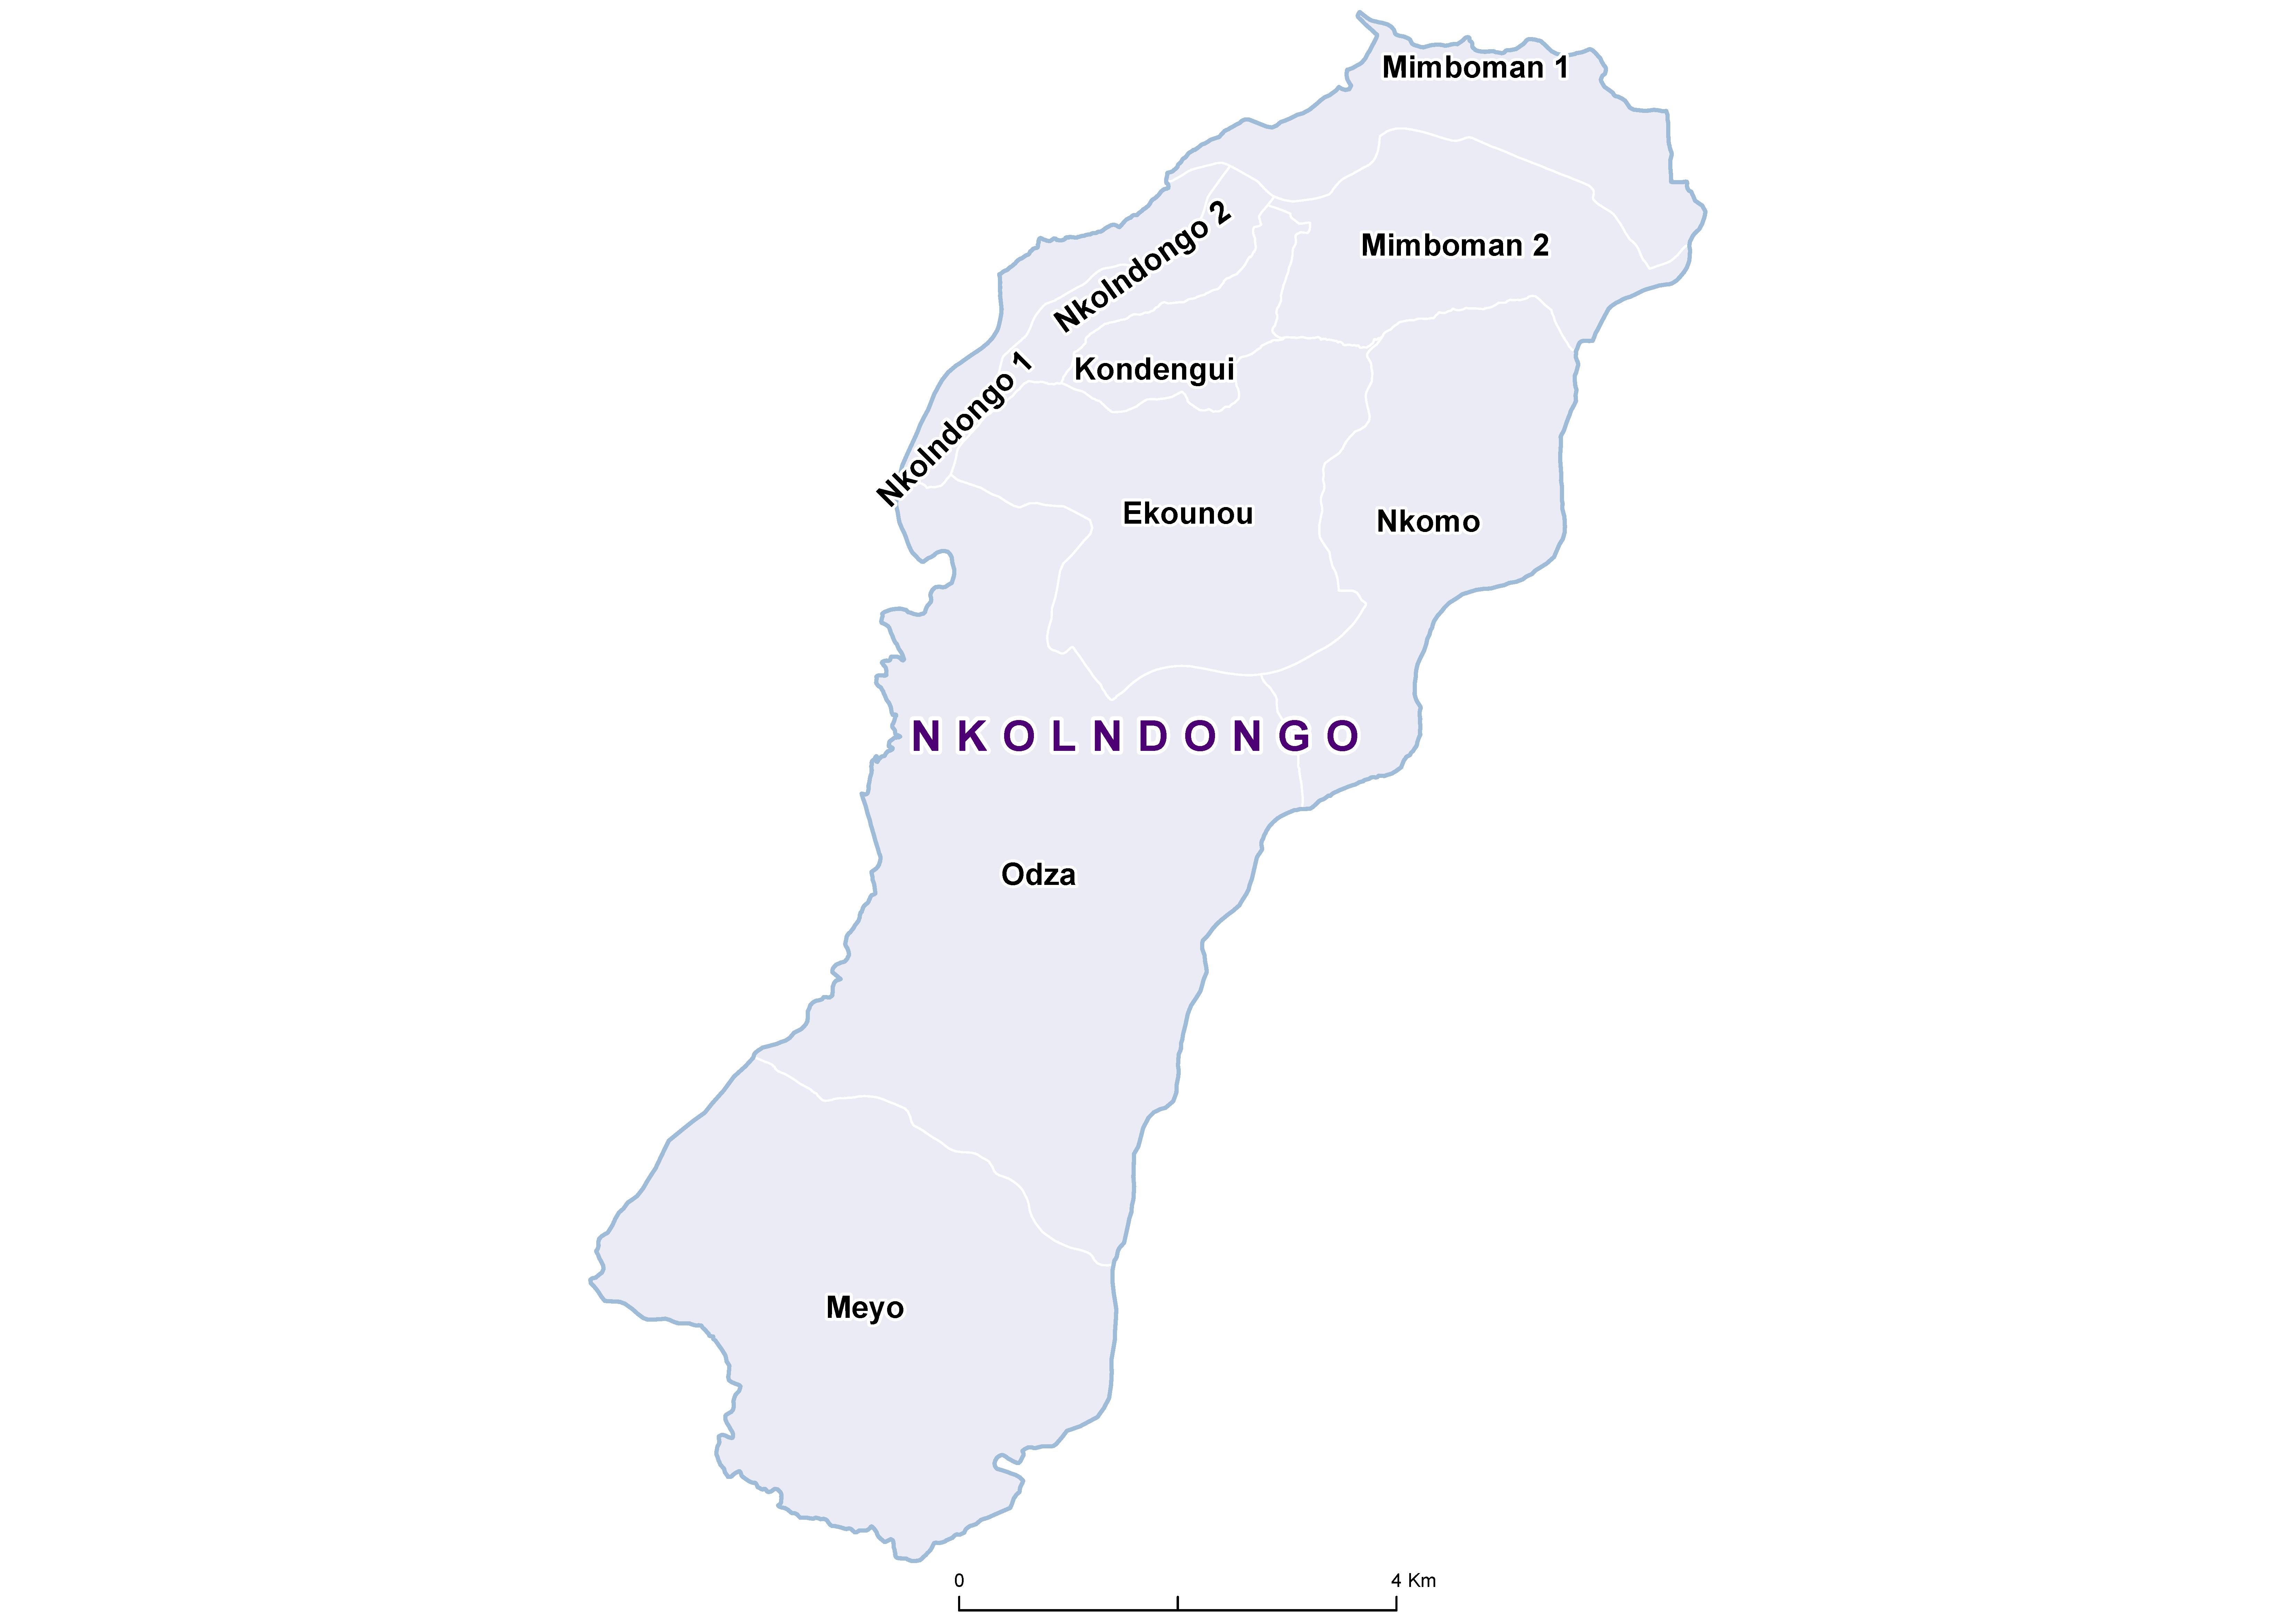 Nkolndongo SCH 19850001